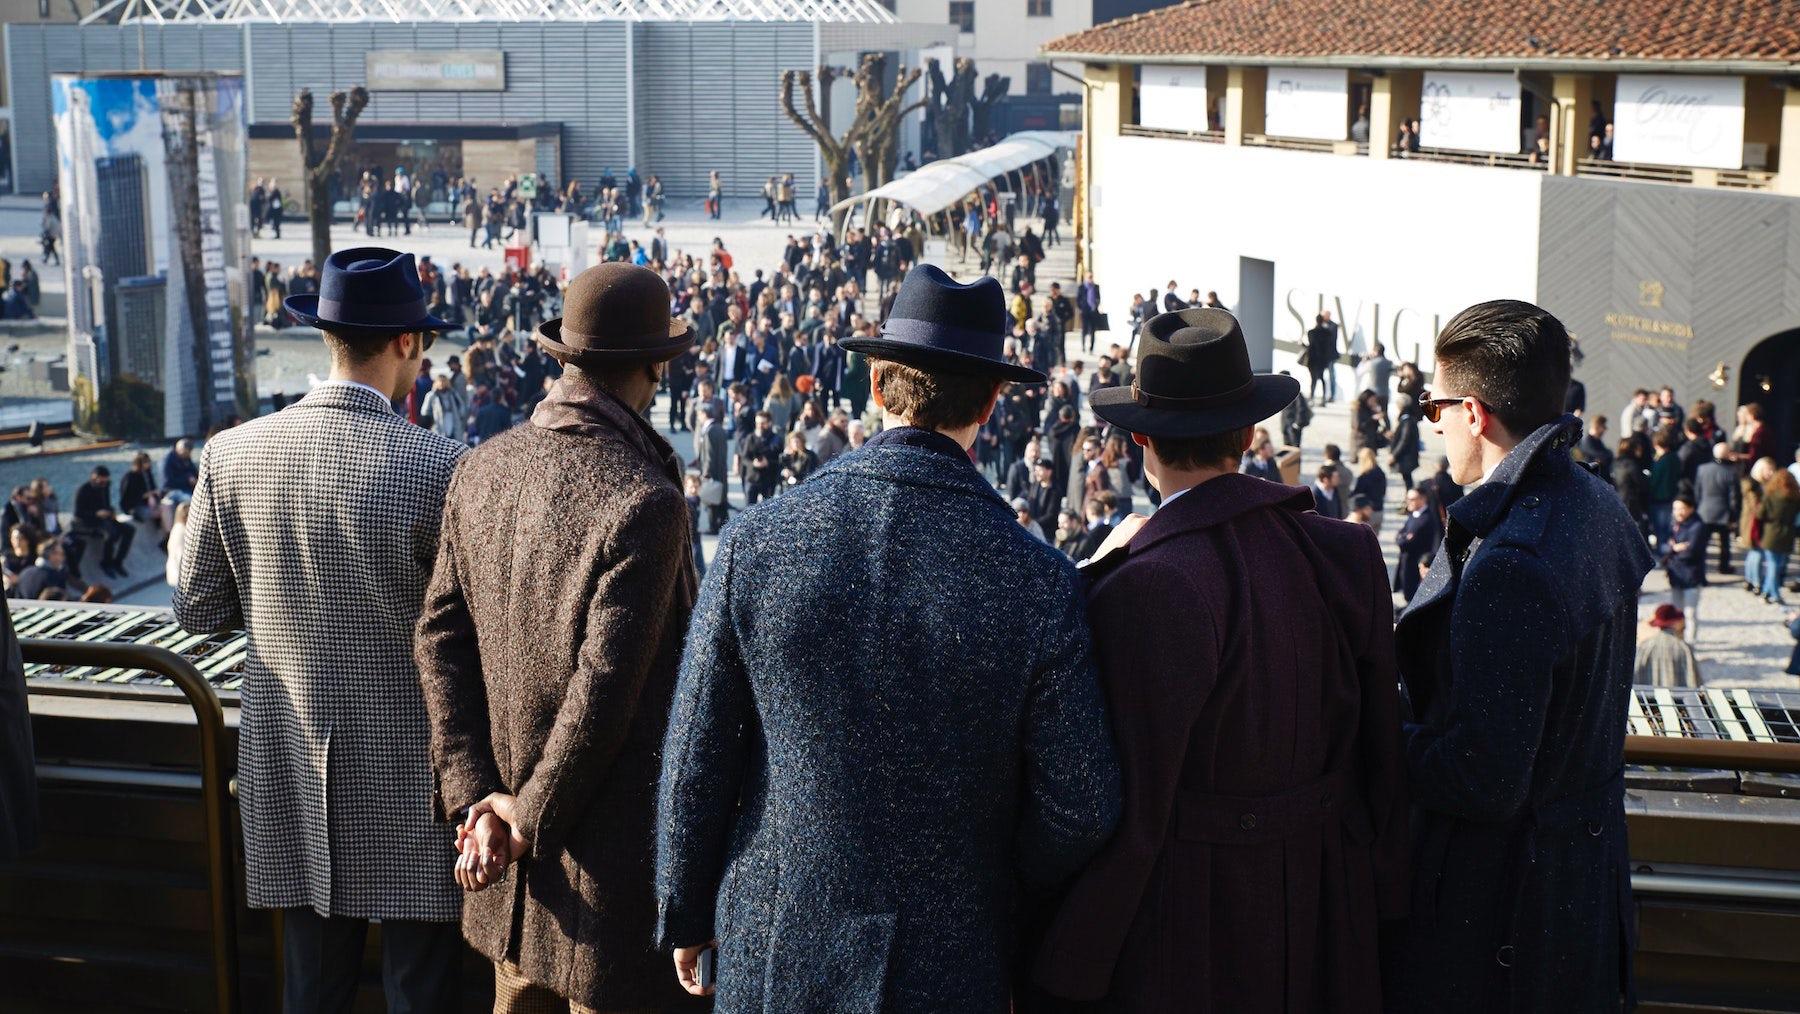 Attendees at Pitti Uomo   Source: Pitti Uomo